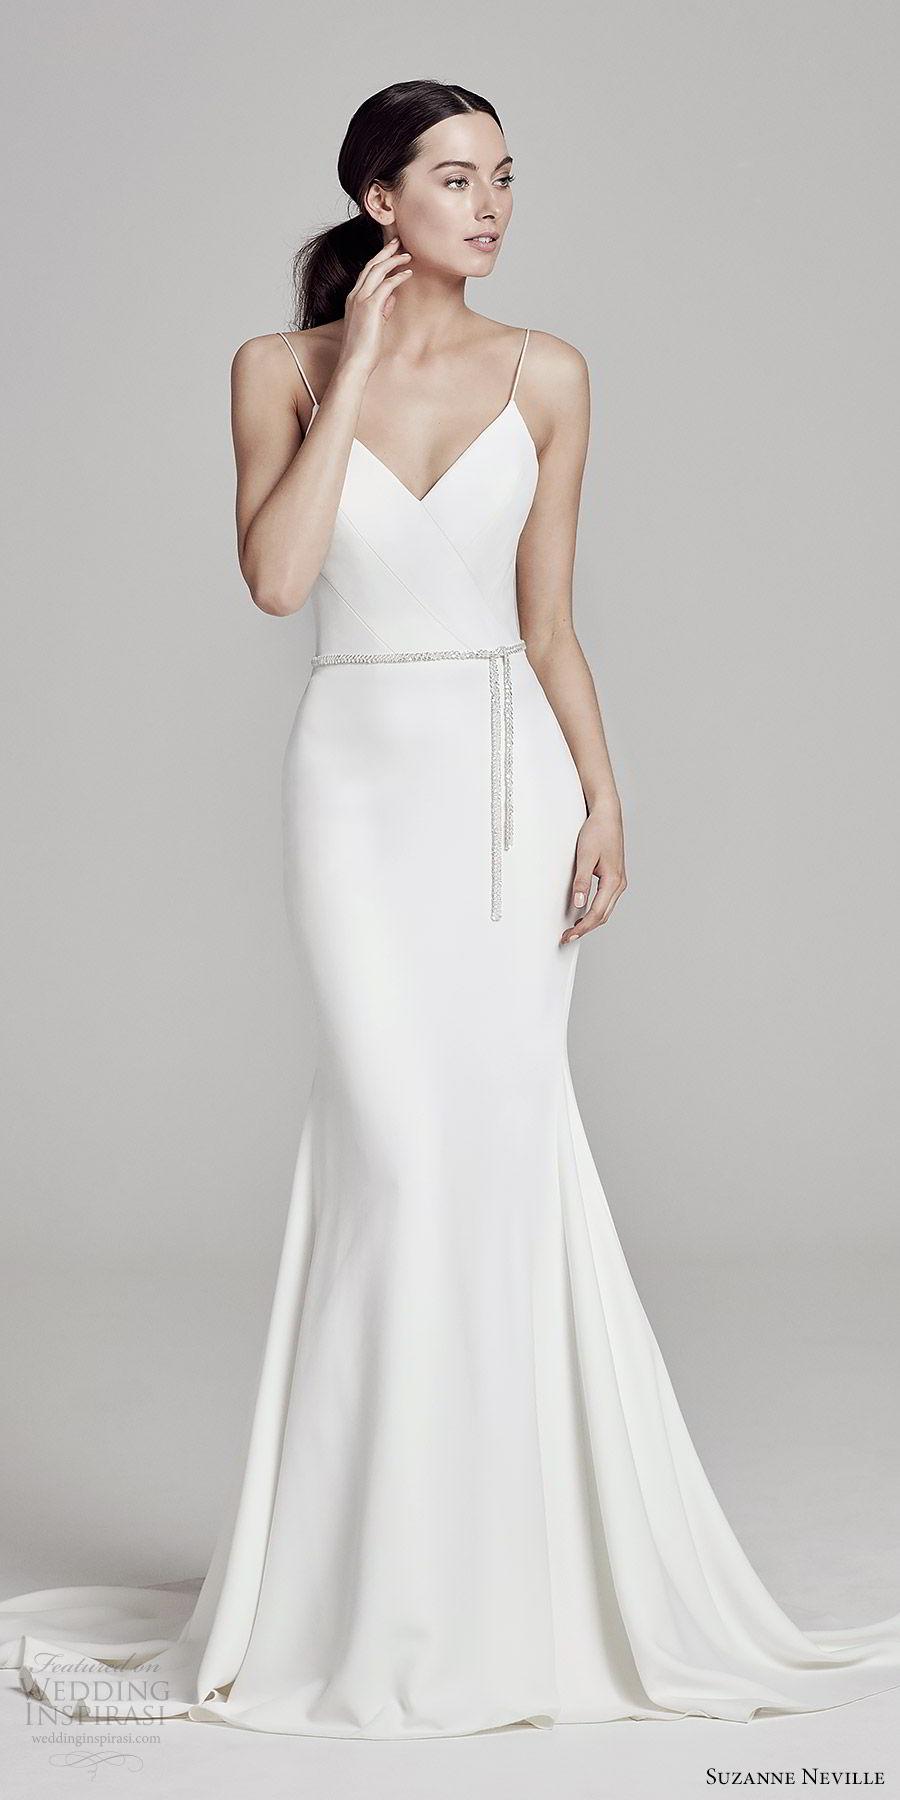 suzanne neville bridal 2019 sleeveless thin straps v neck clean sheath wedding dress (venus) chapel train chic modern mv